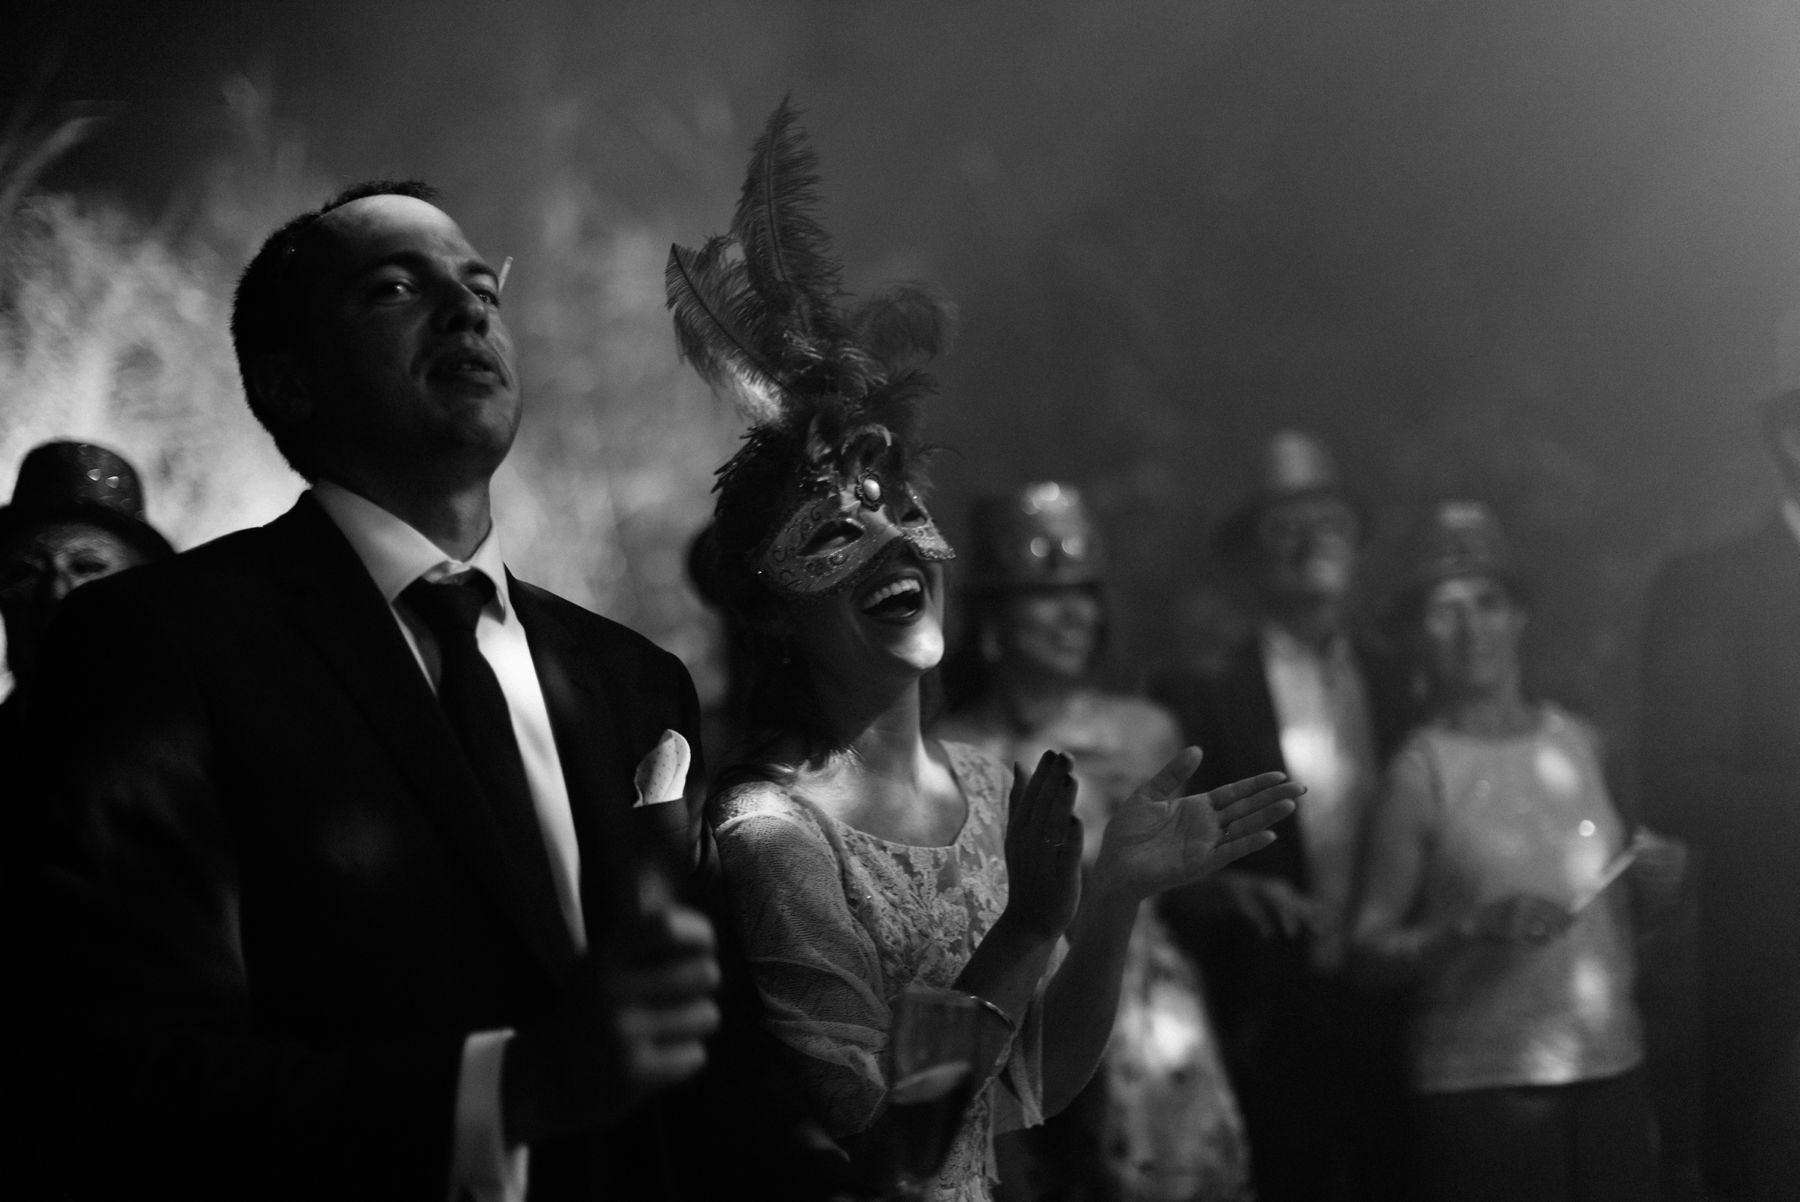 fotografo de bodas Jairo Crena-244